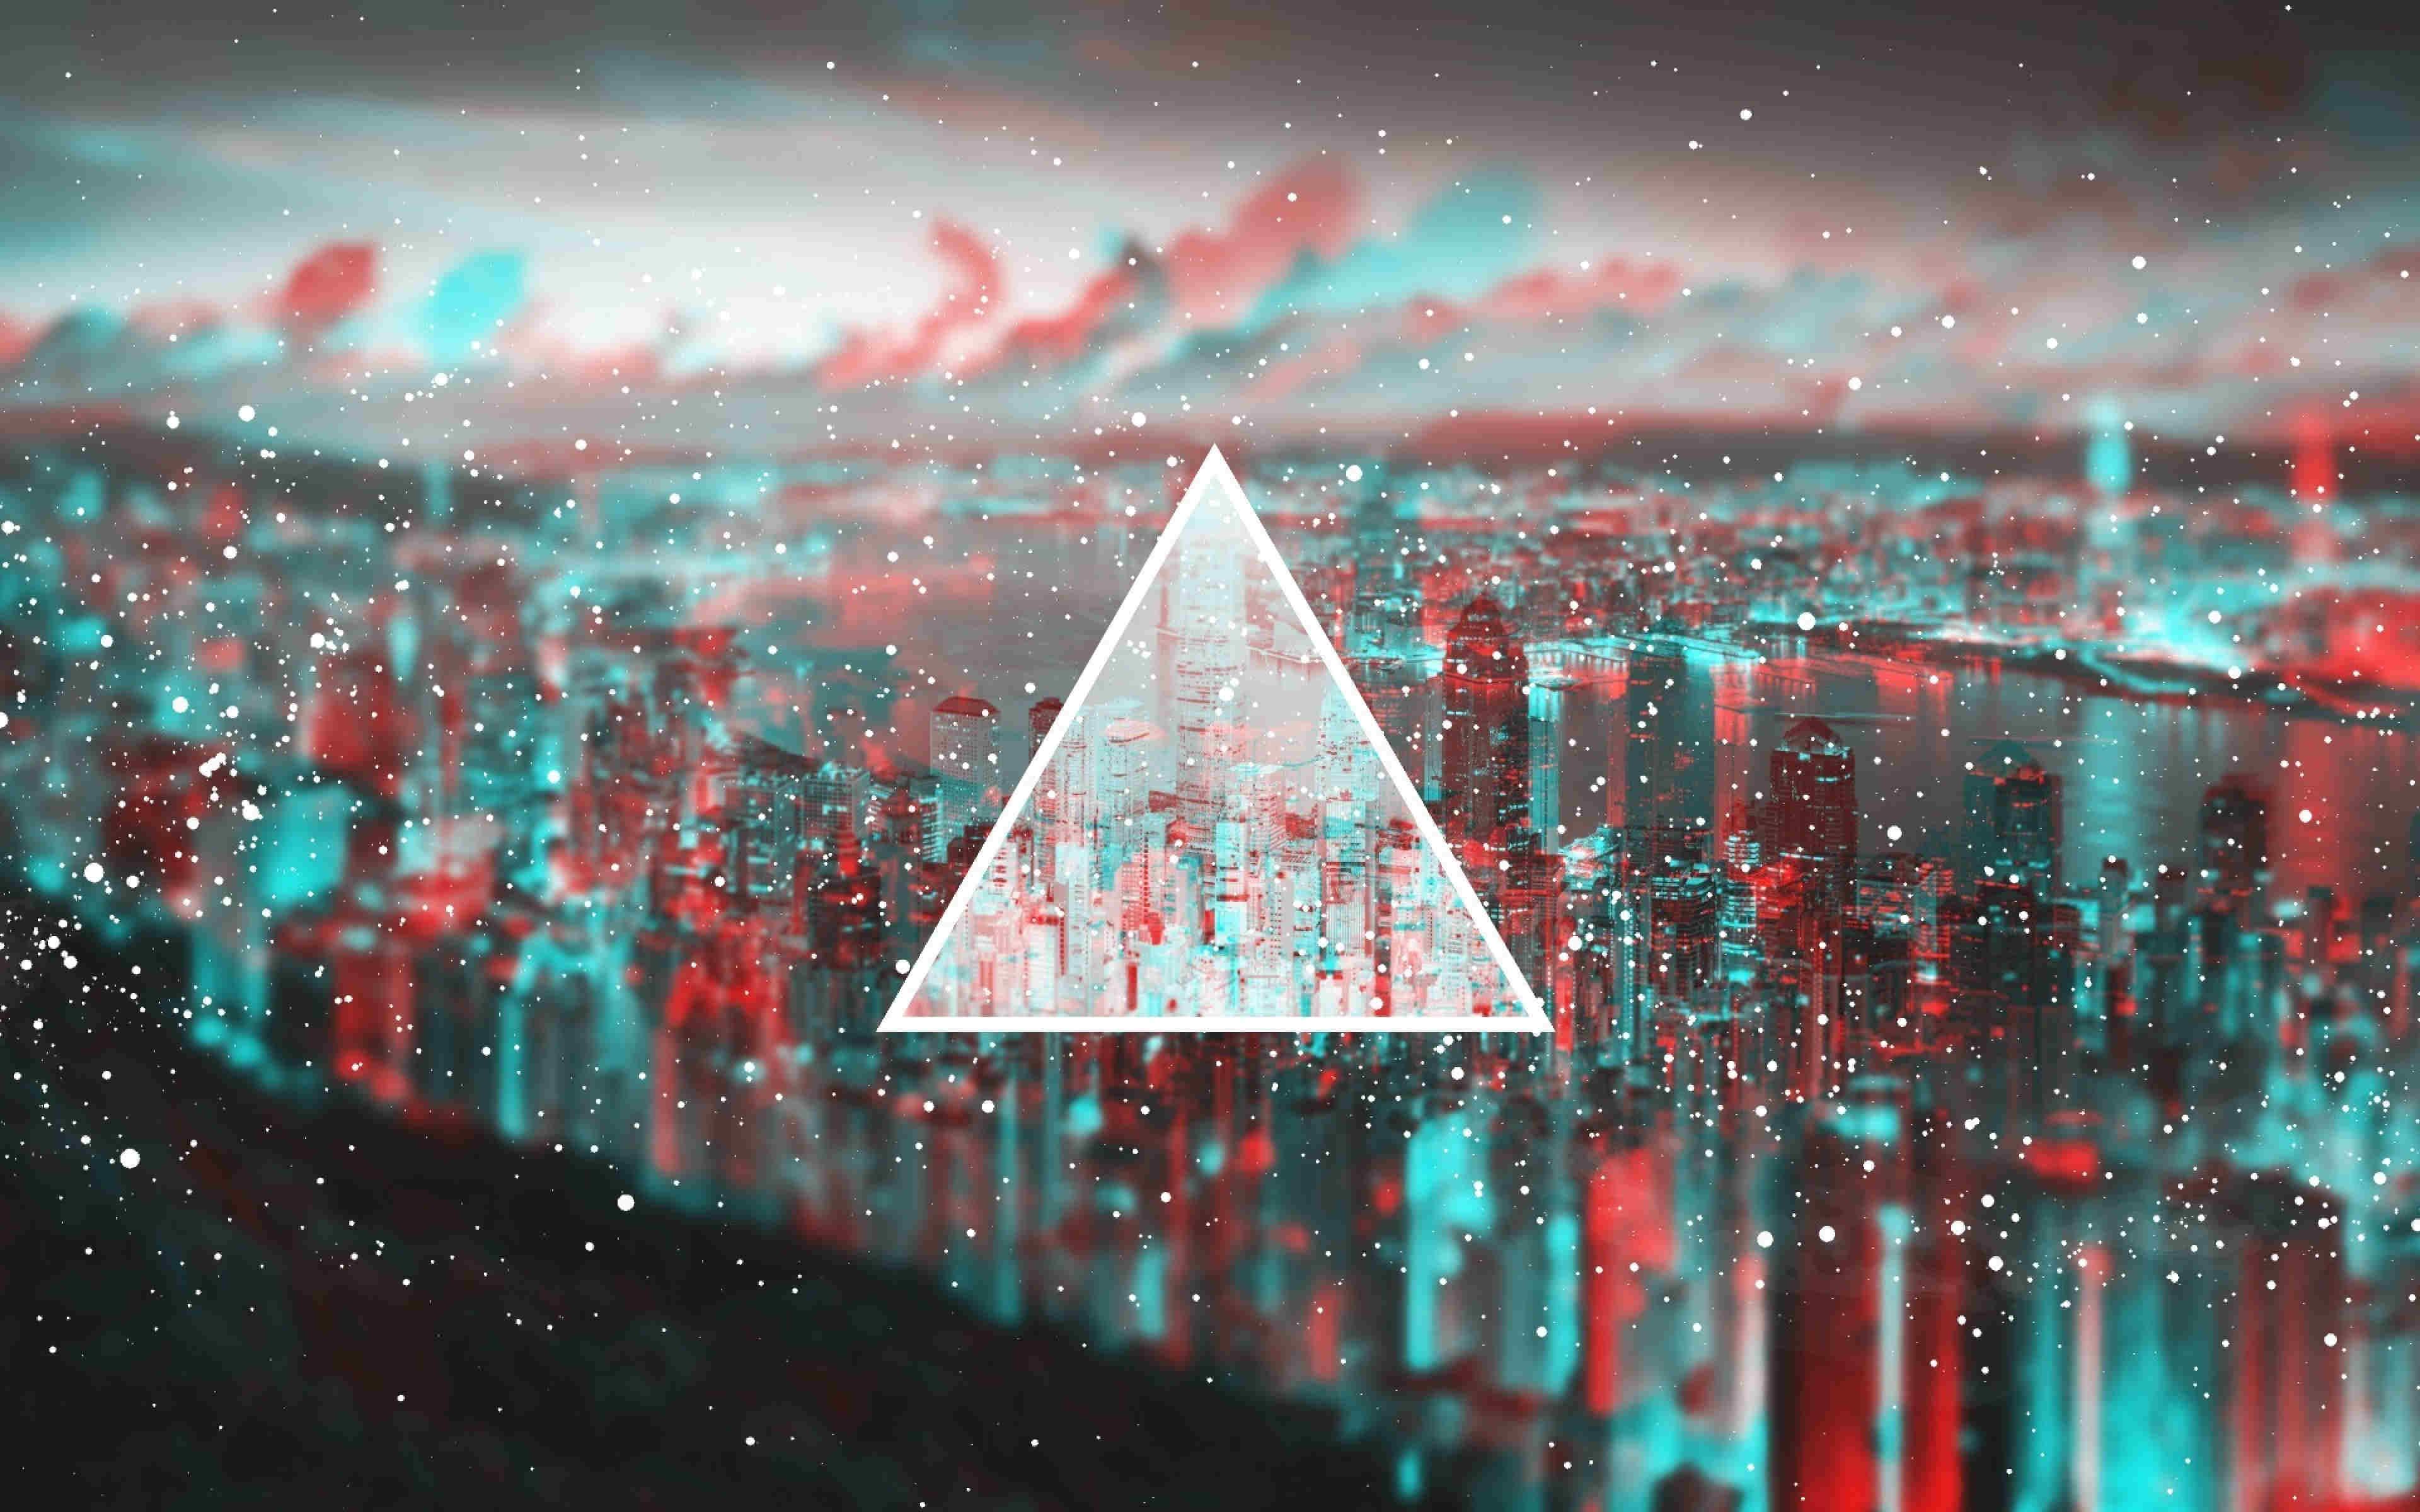 Triangle Light Blurred Wallpaper